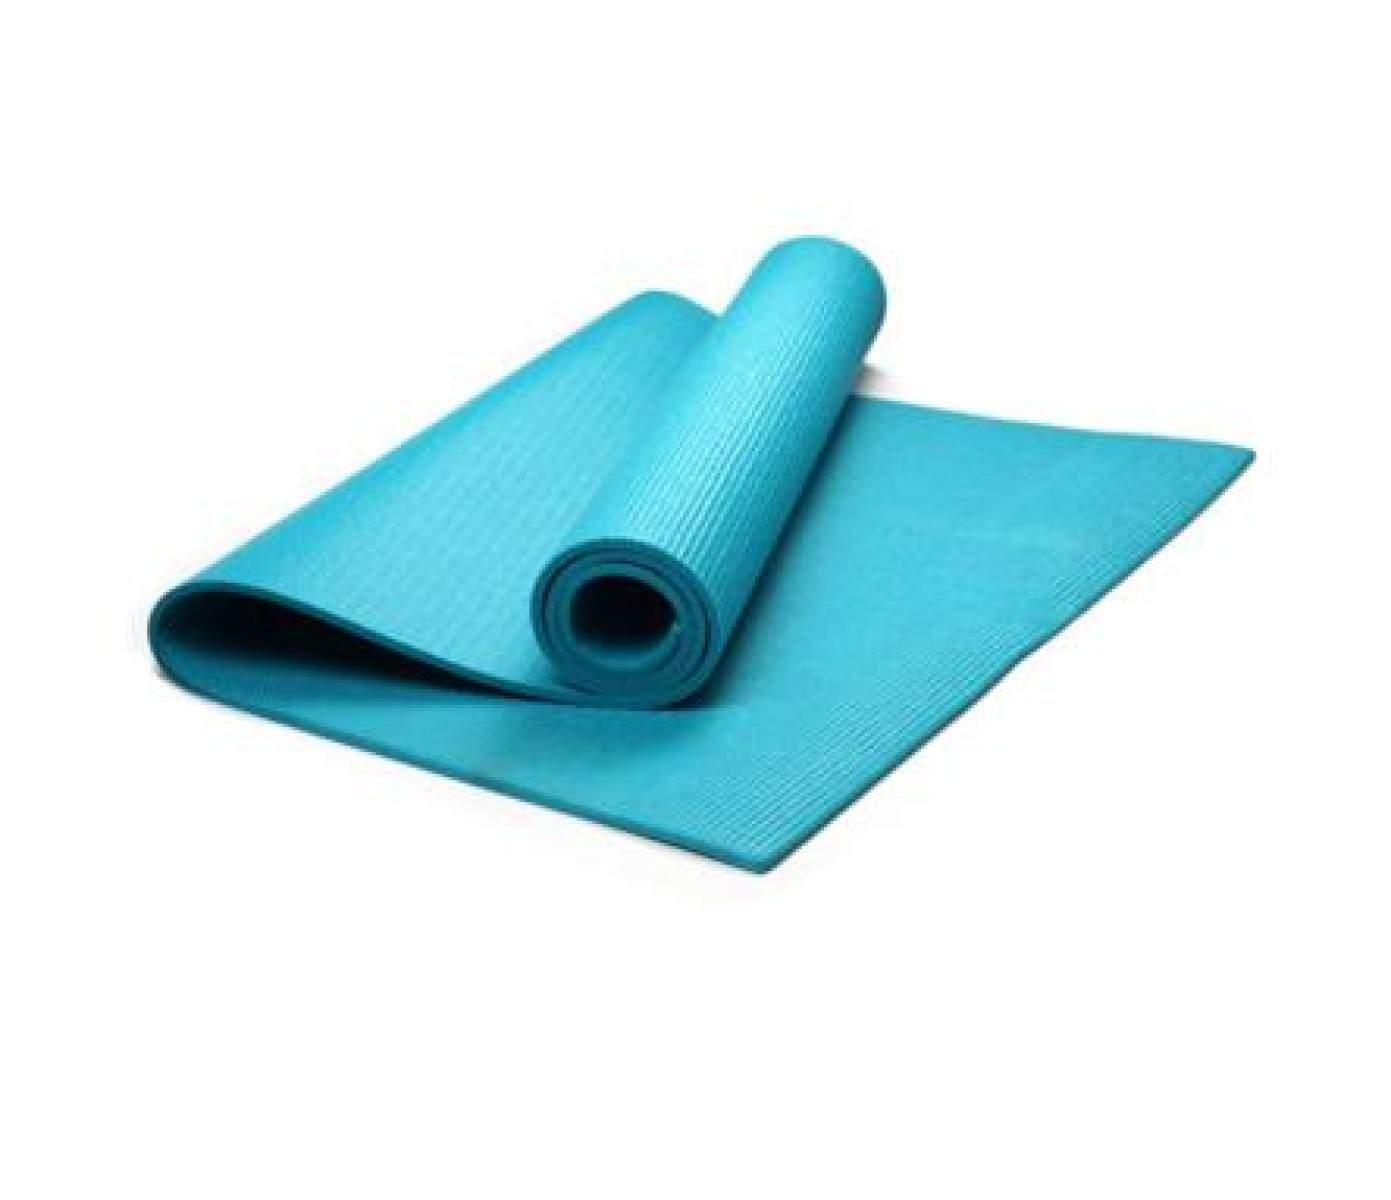 ZHANGHAOBO Yoga Matten Naturkautschuk Rutschfeste Matten Verbreiterte Gummi Anti-Rutsch-Mützen,A3